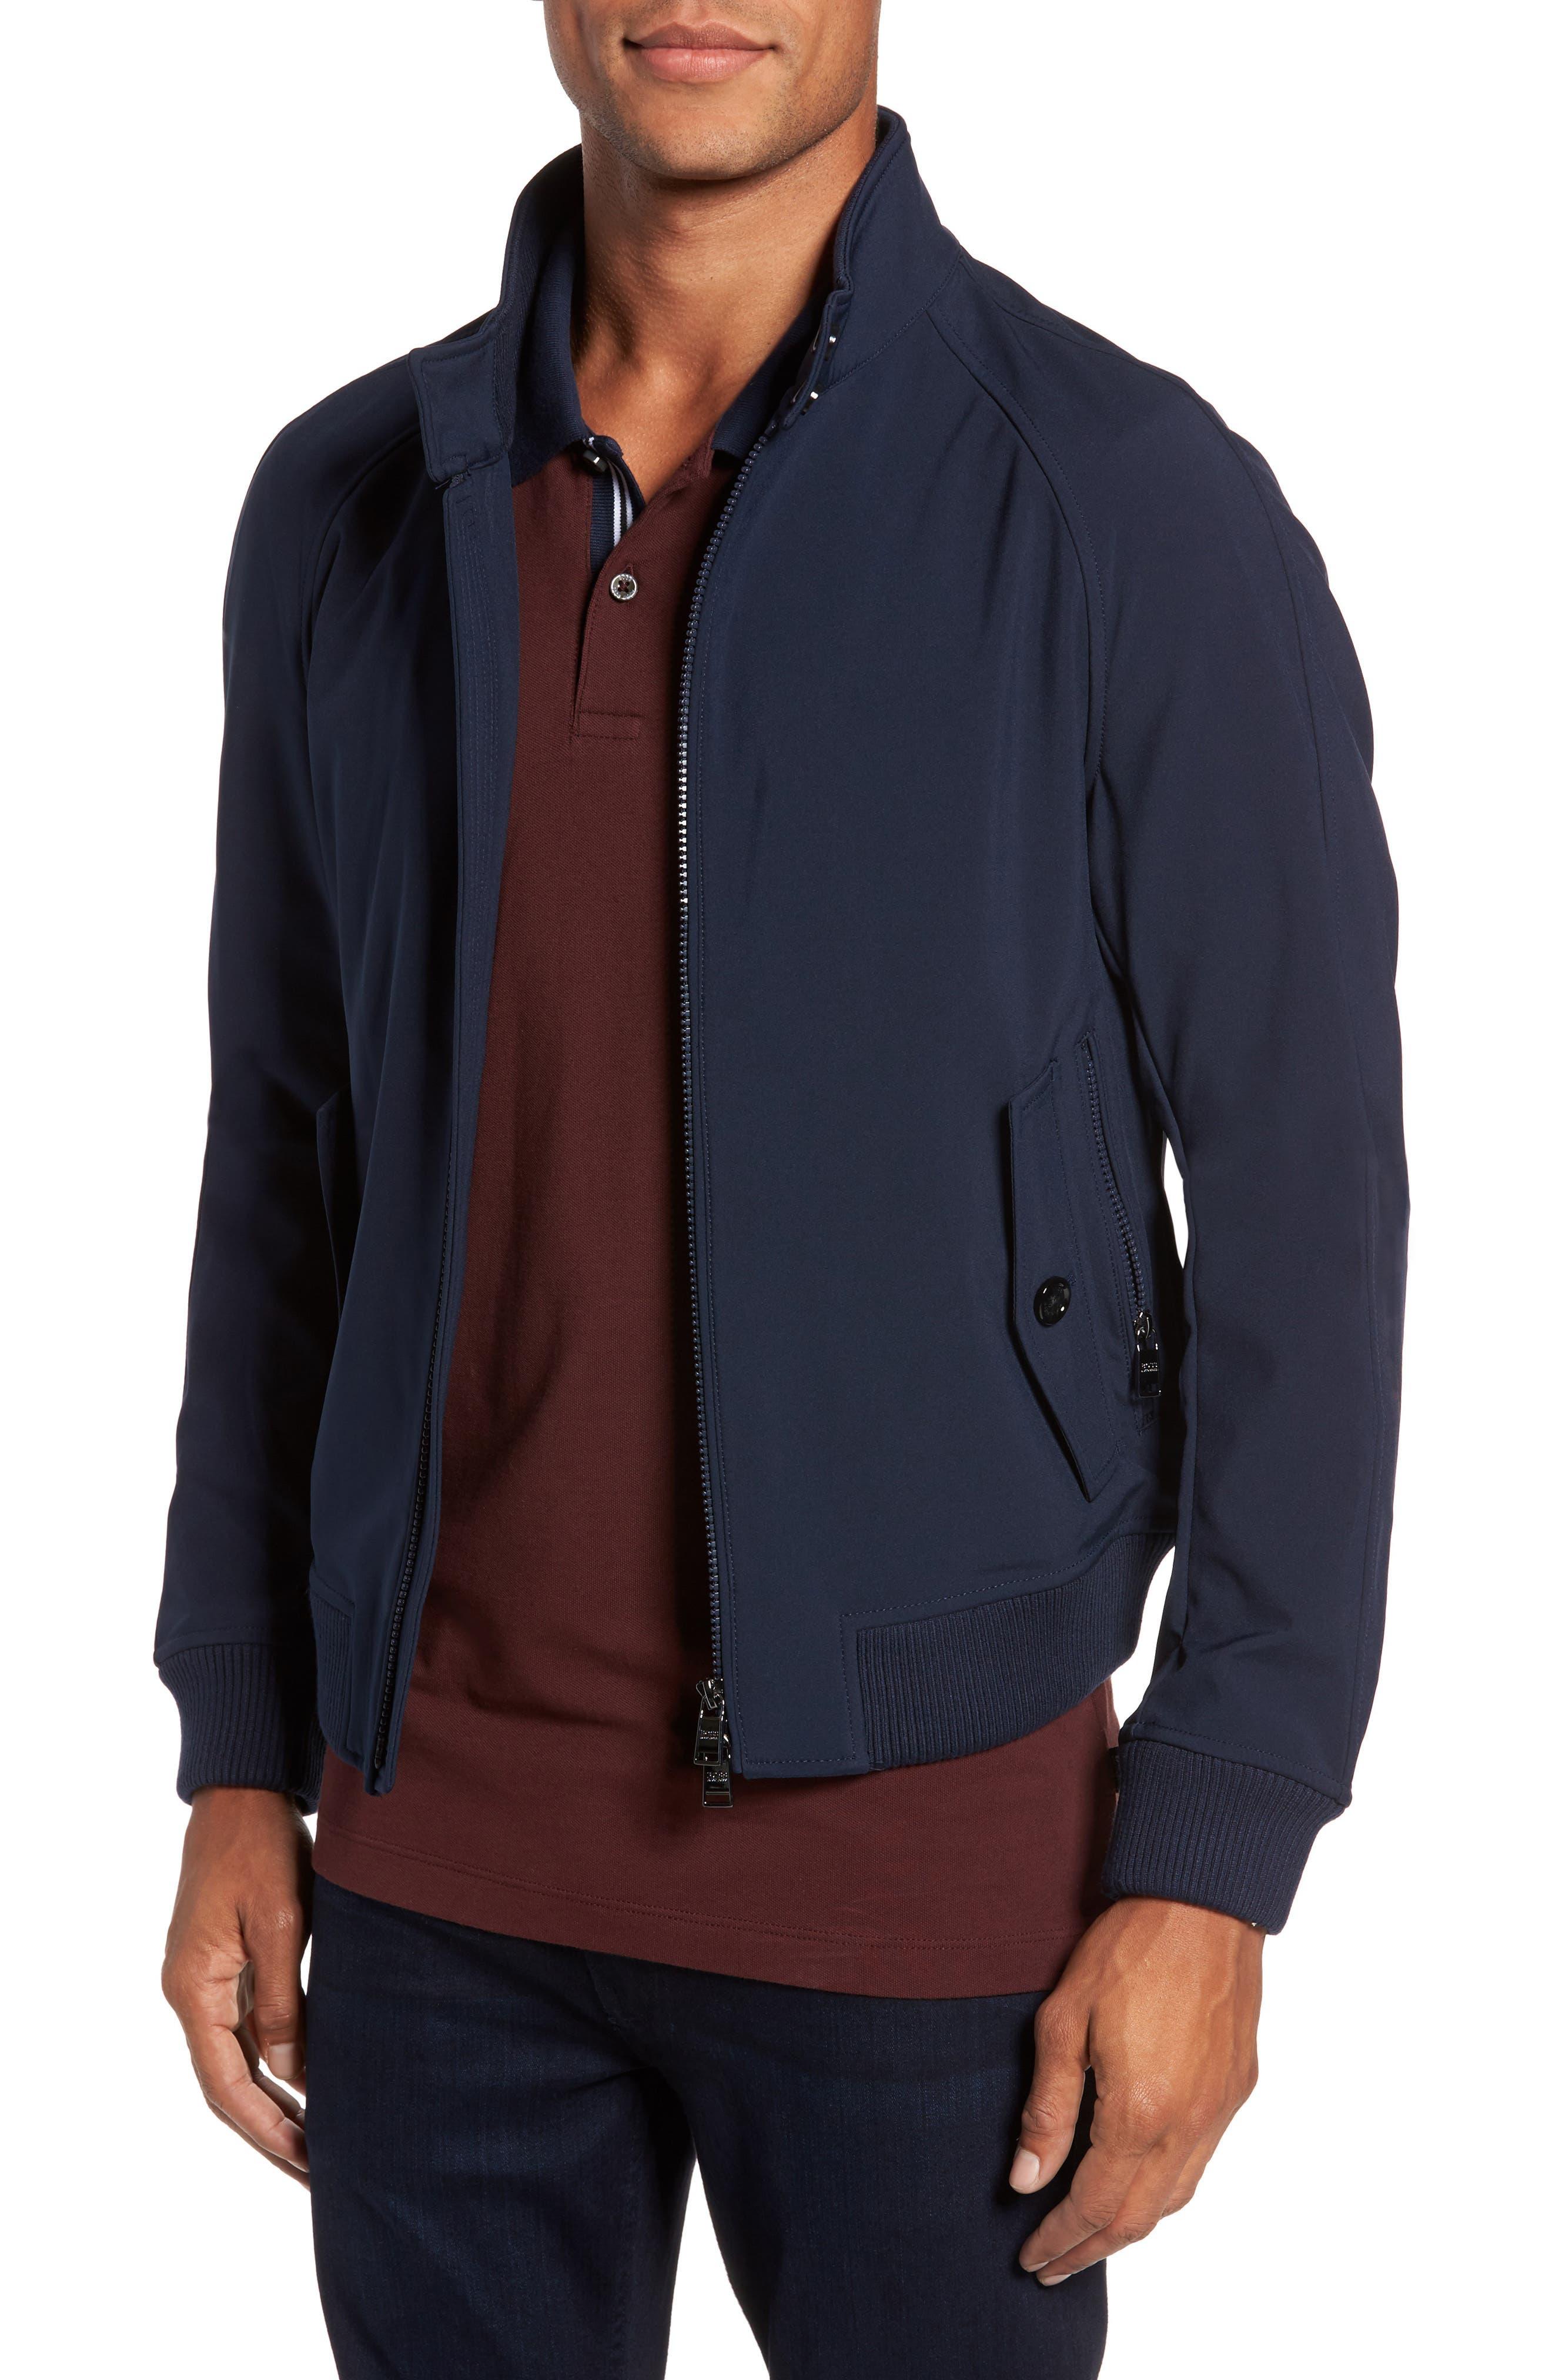 Corva Technical Jacket,                         Main,                         color, Navy